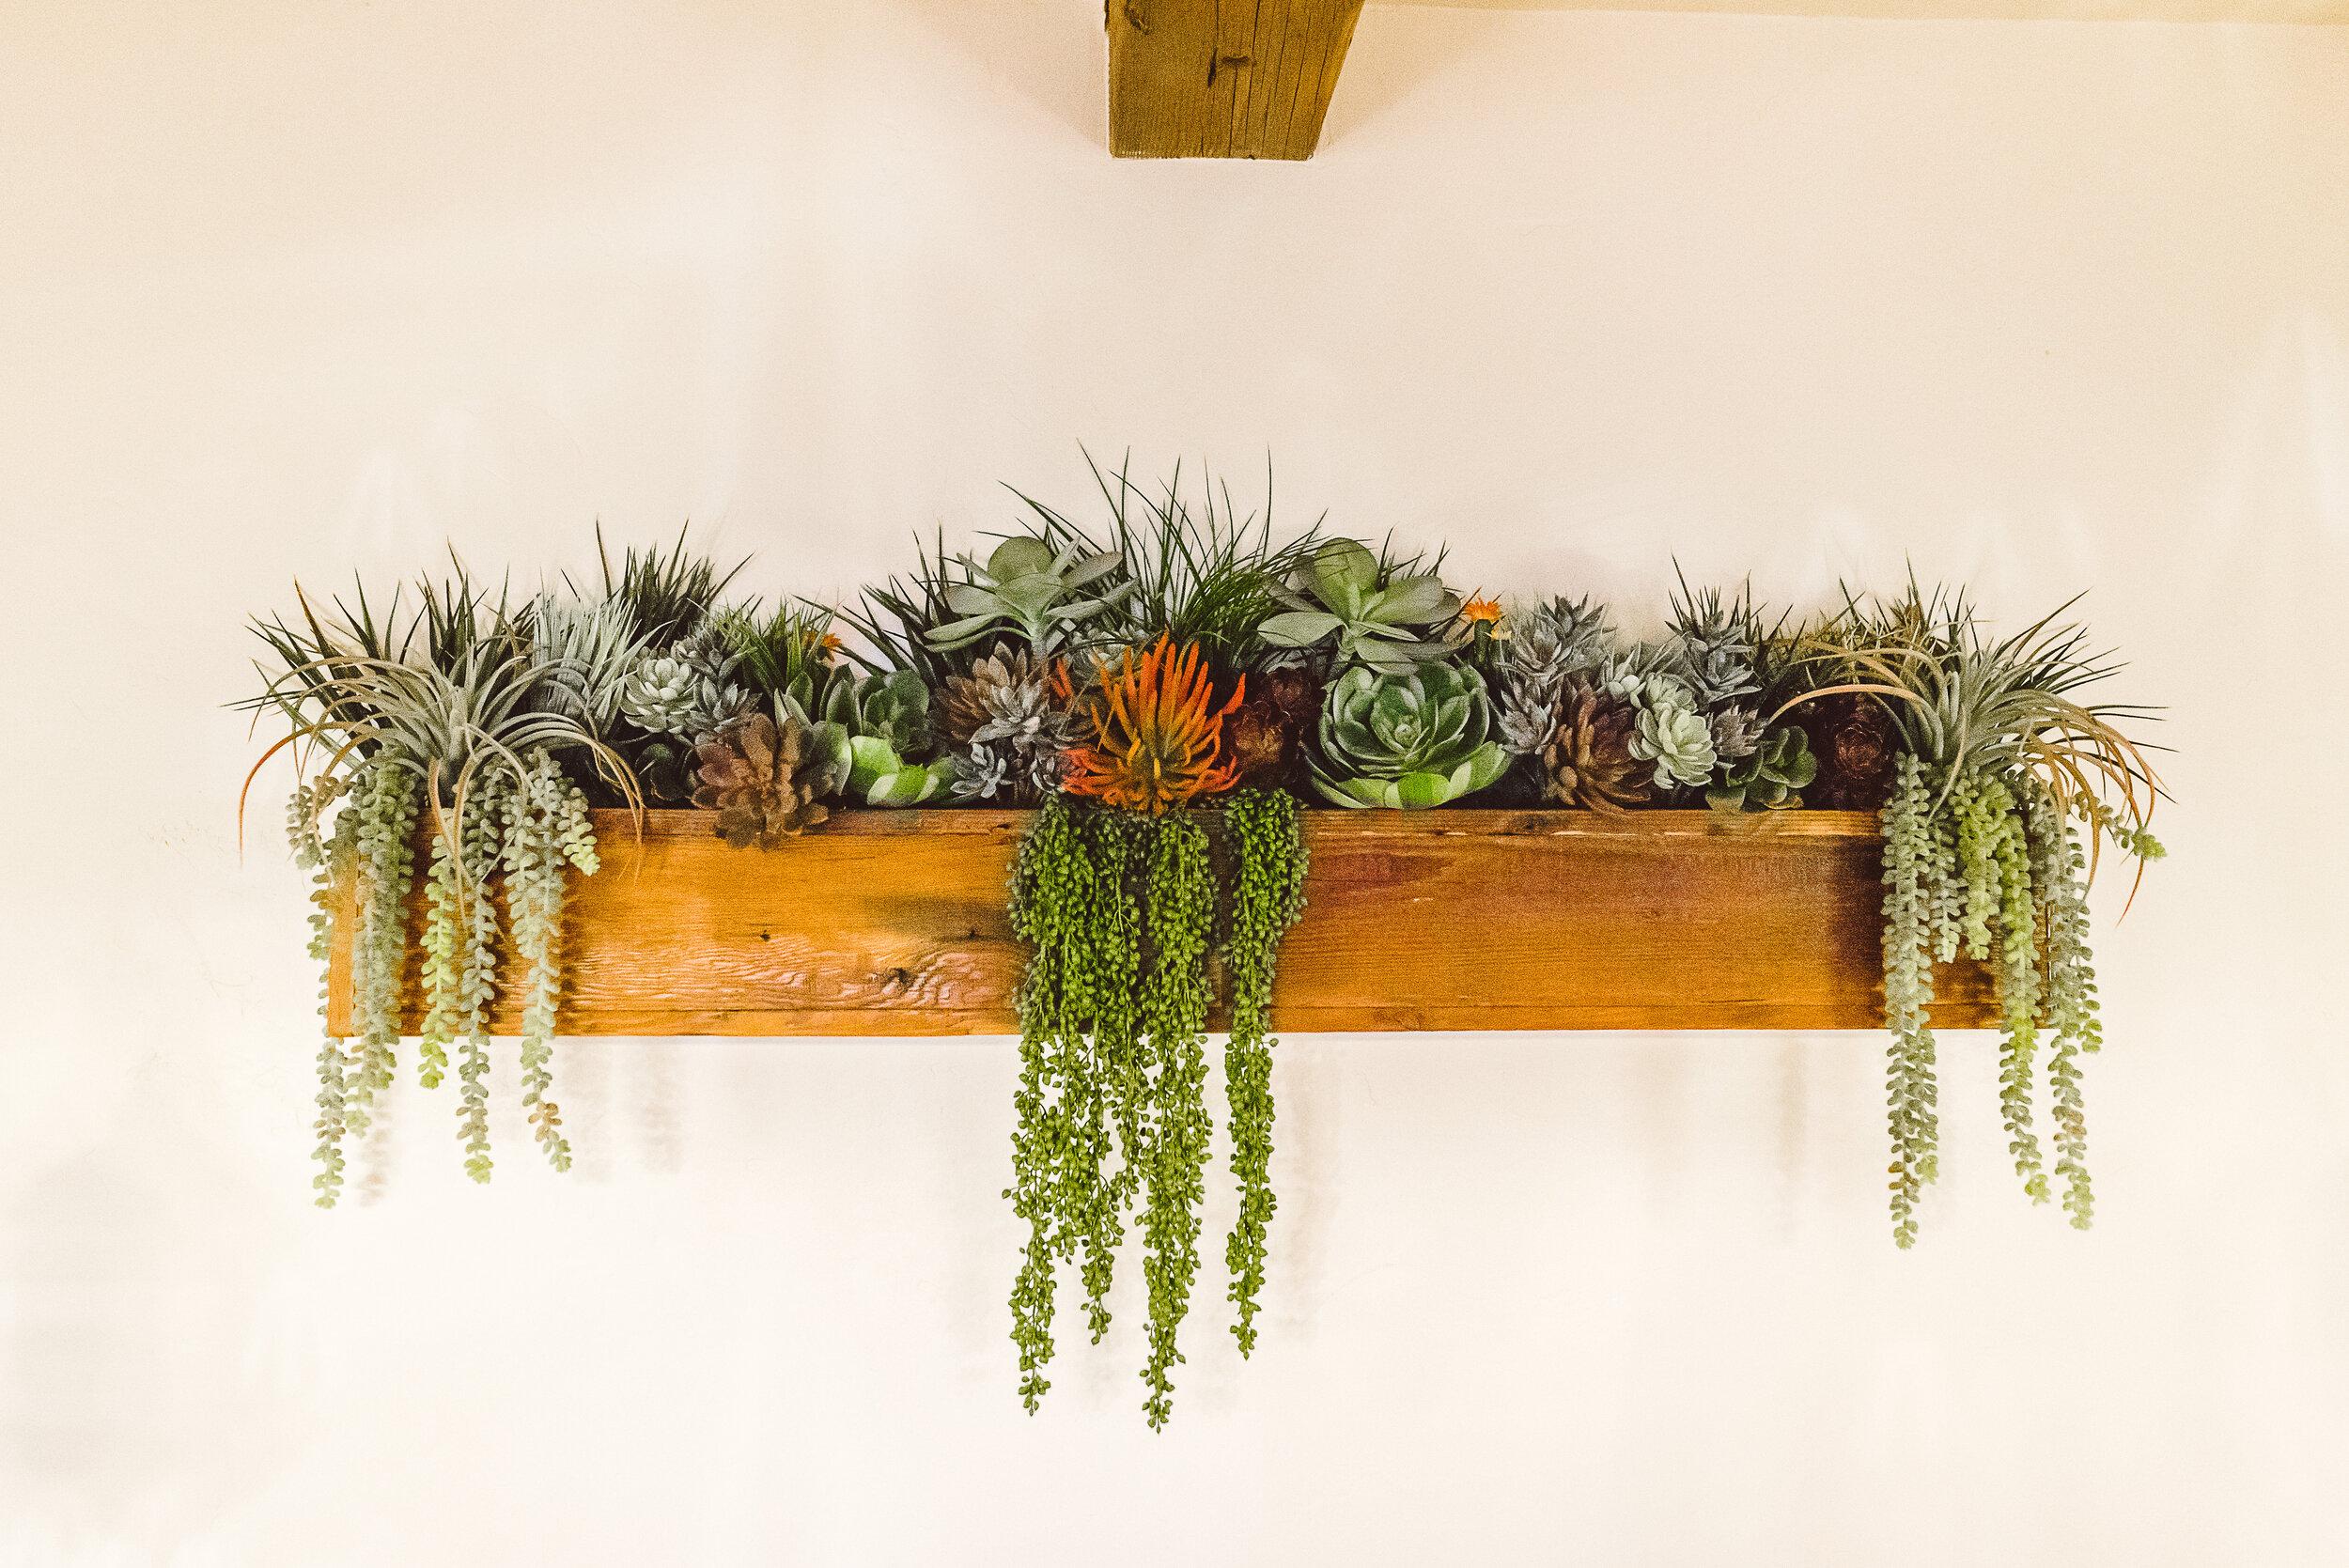 2018 Marie Monforte_Succulents at Cocina -8.jpg